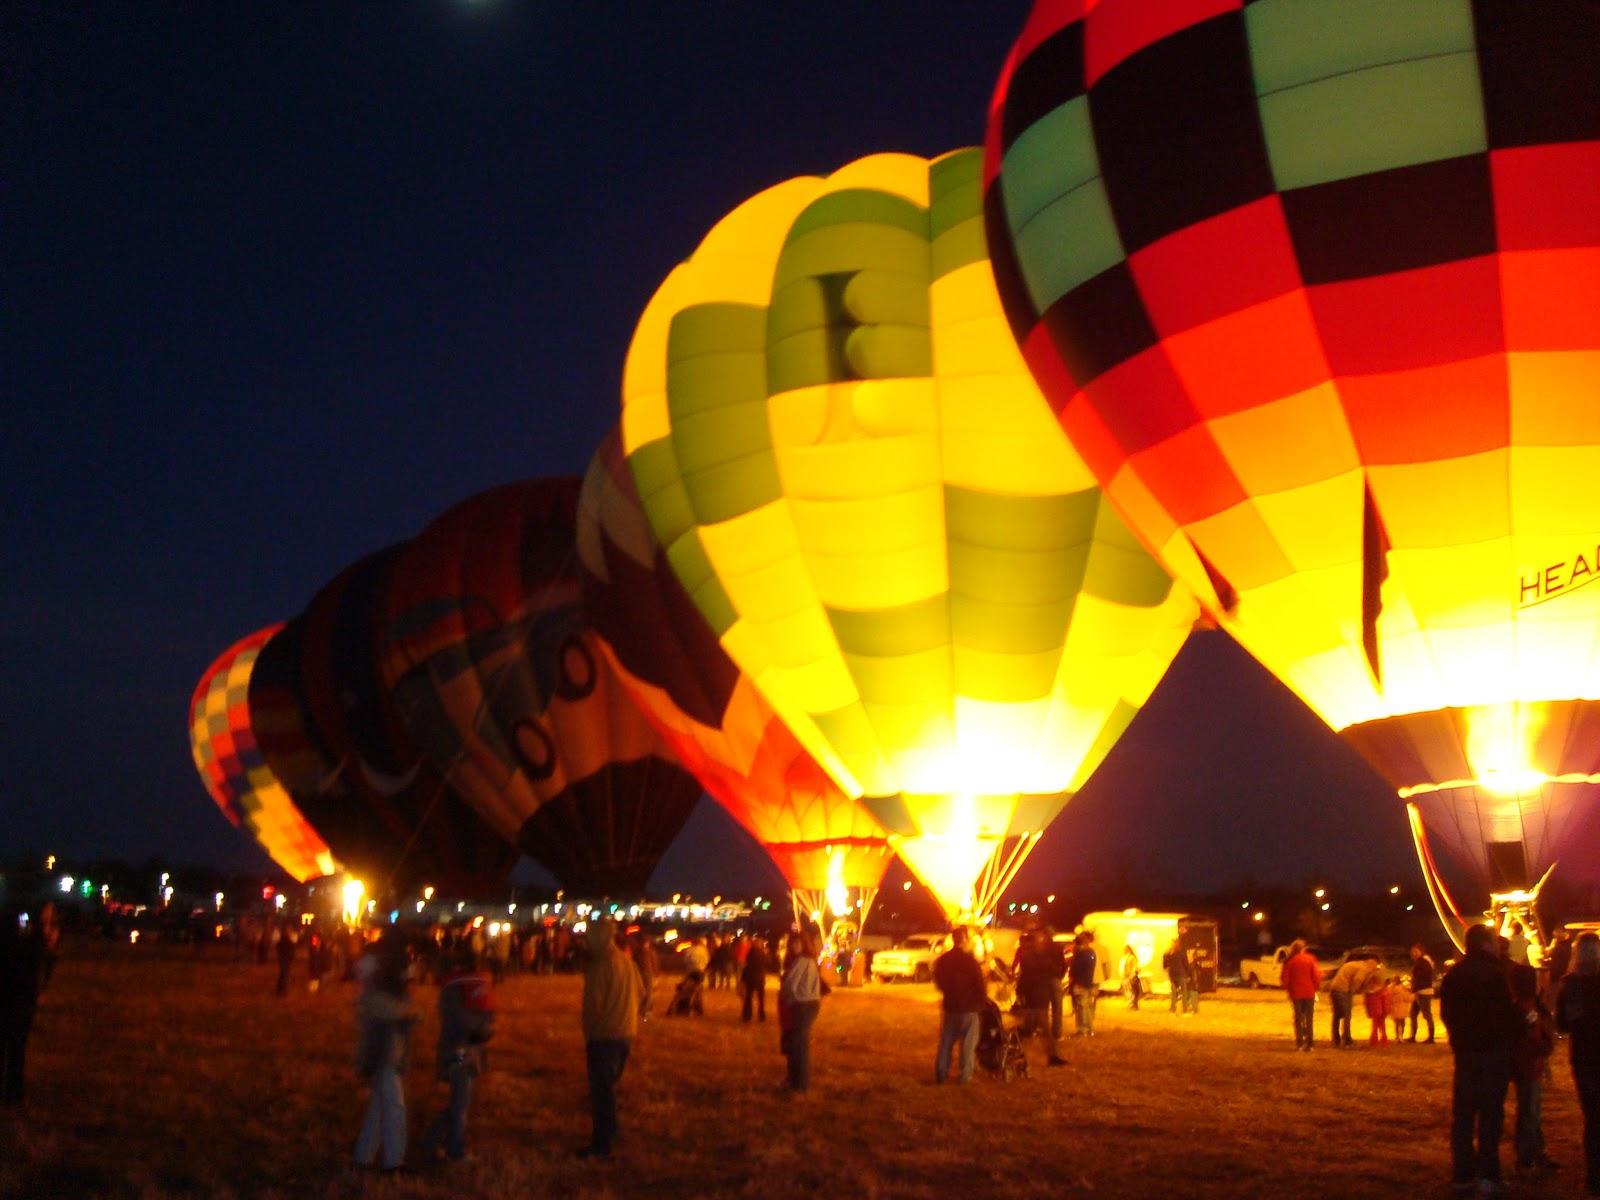 Best Wallpaper Night Hot Air Balloon - Balloon+Night  Picture-841479.JPG